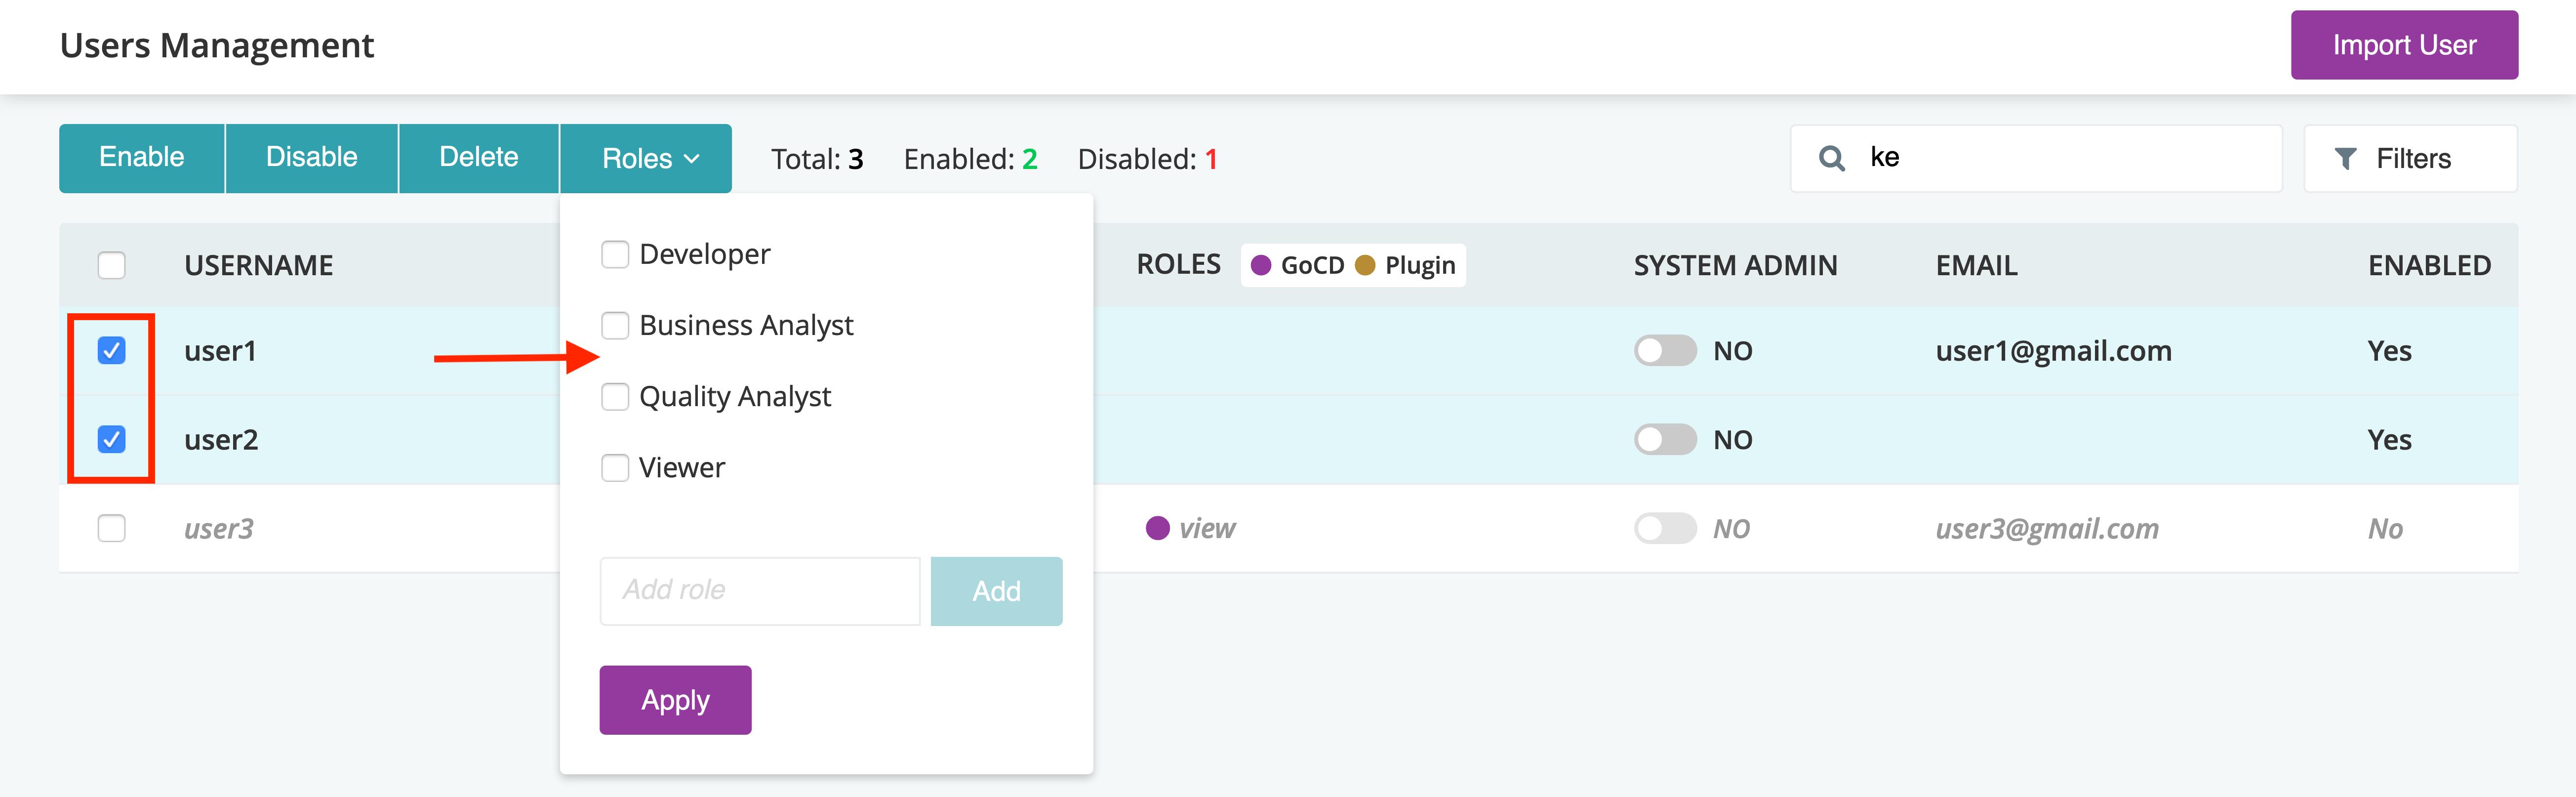 Managing Users   GoCD User Documentation